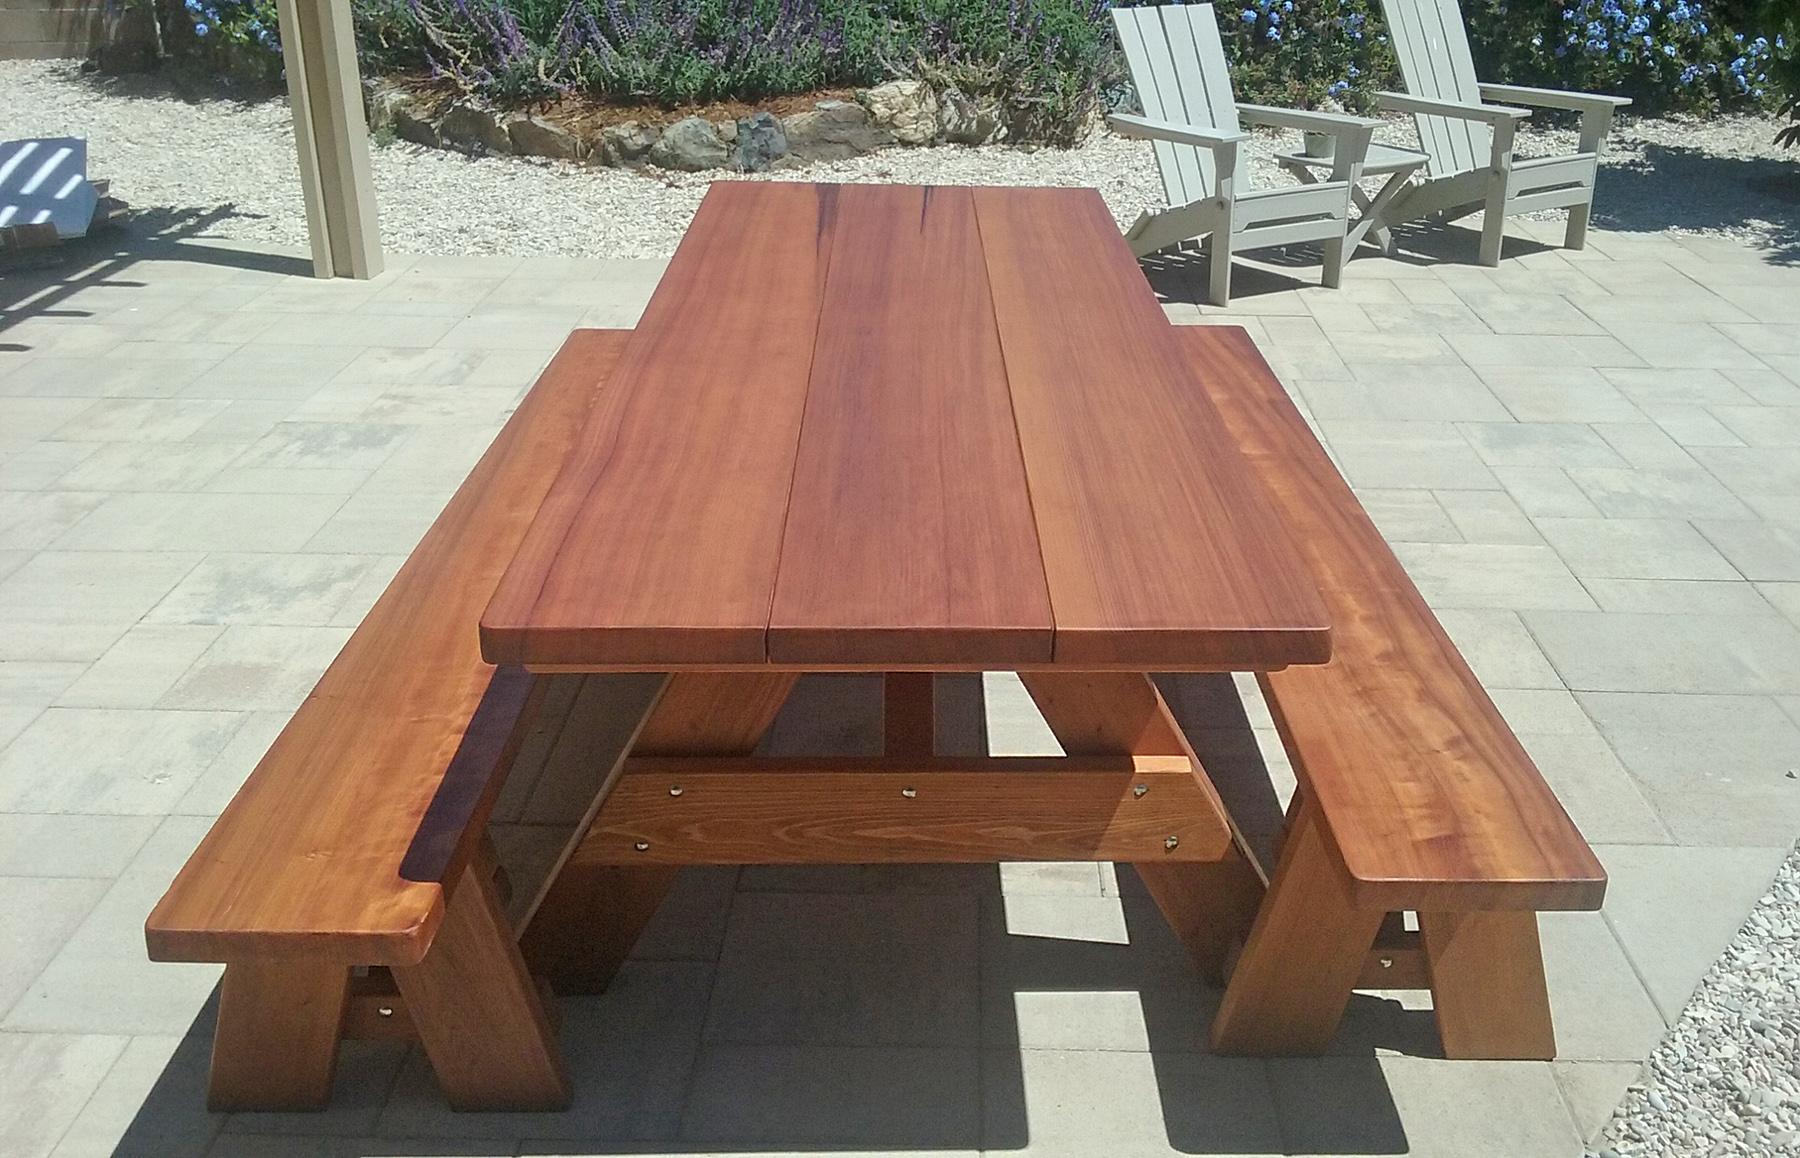 Large Wooden Picnic Table Custom Wood Picnic Table Kit - Large wooden picnic table